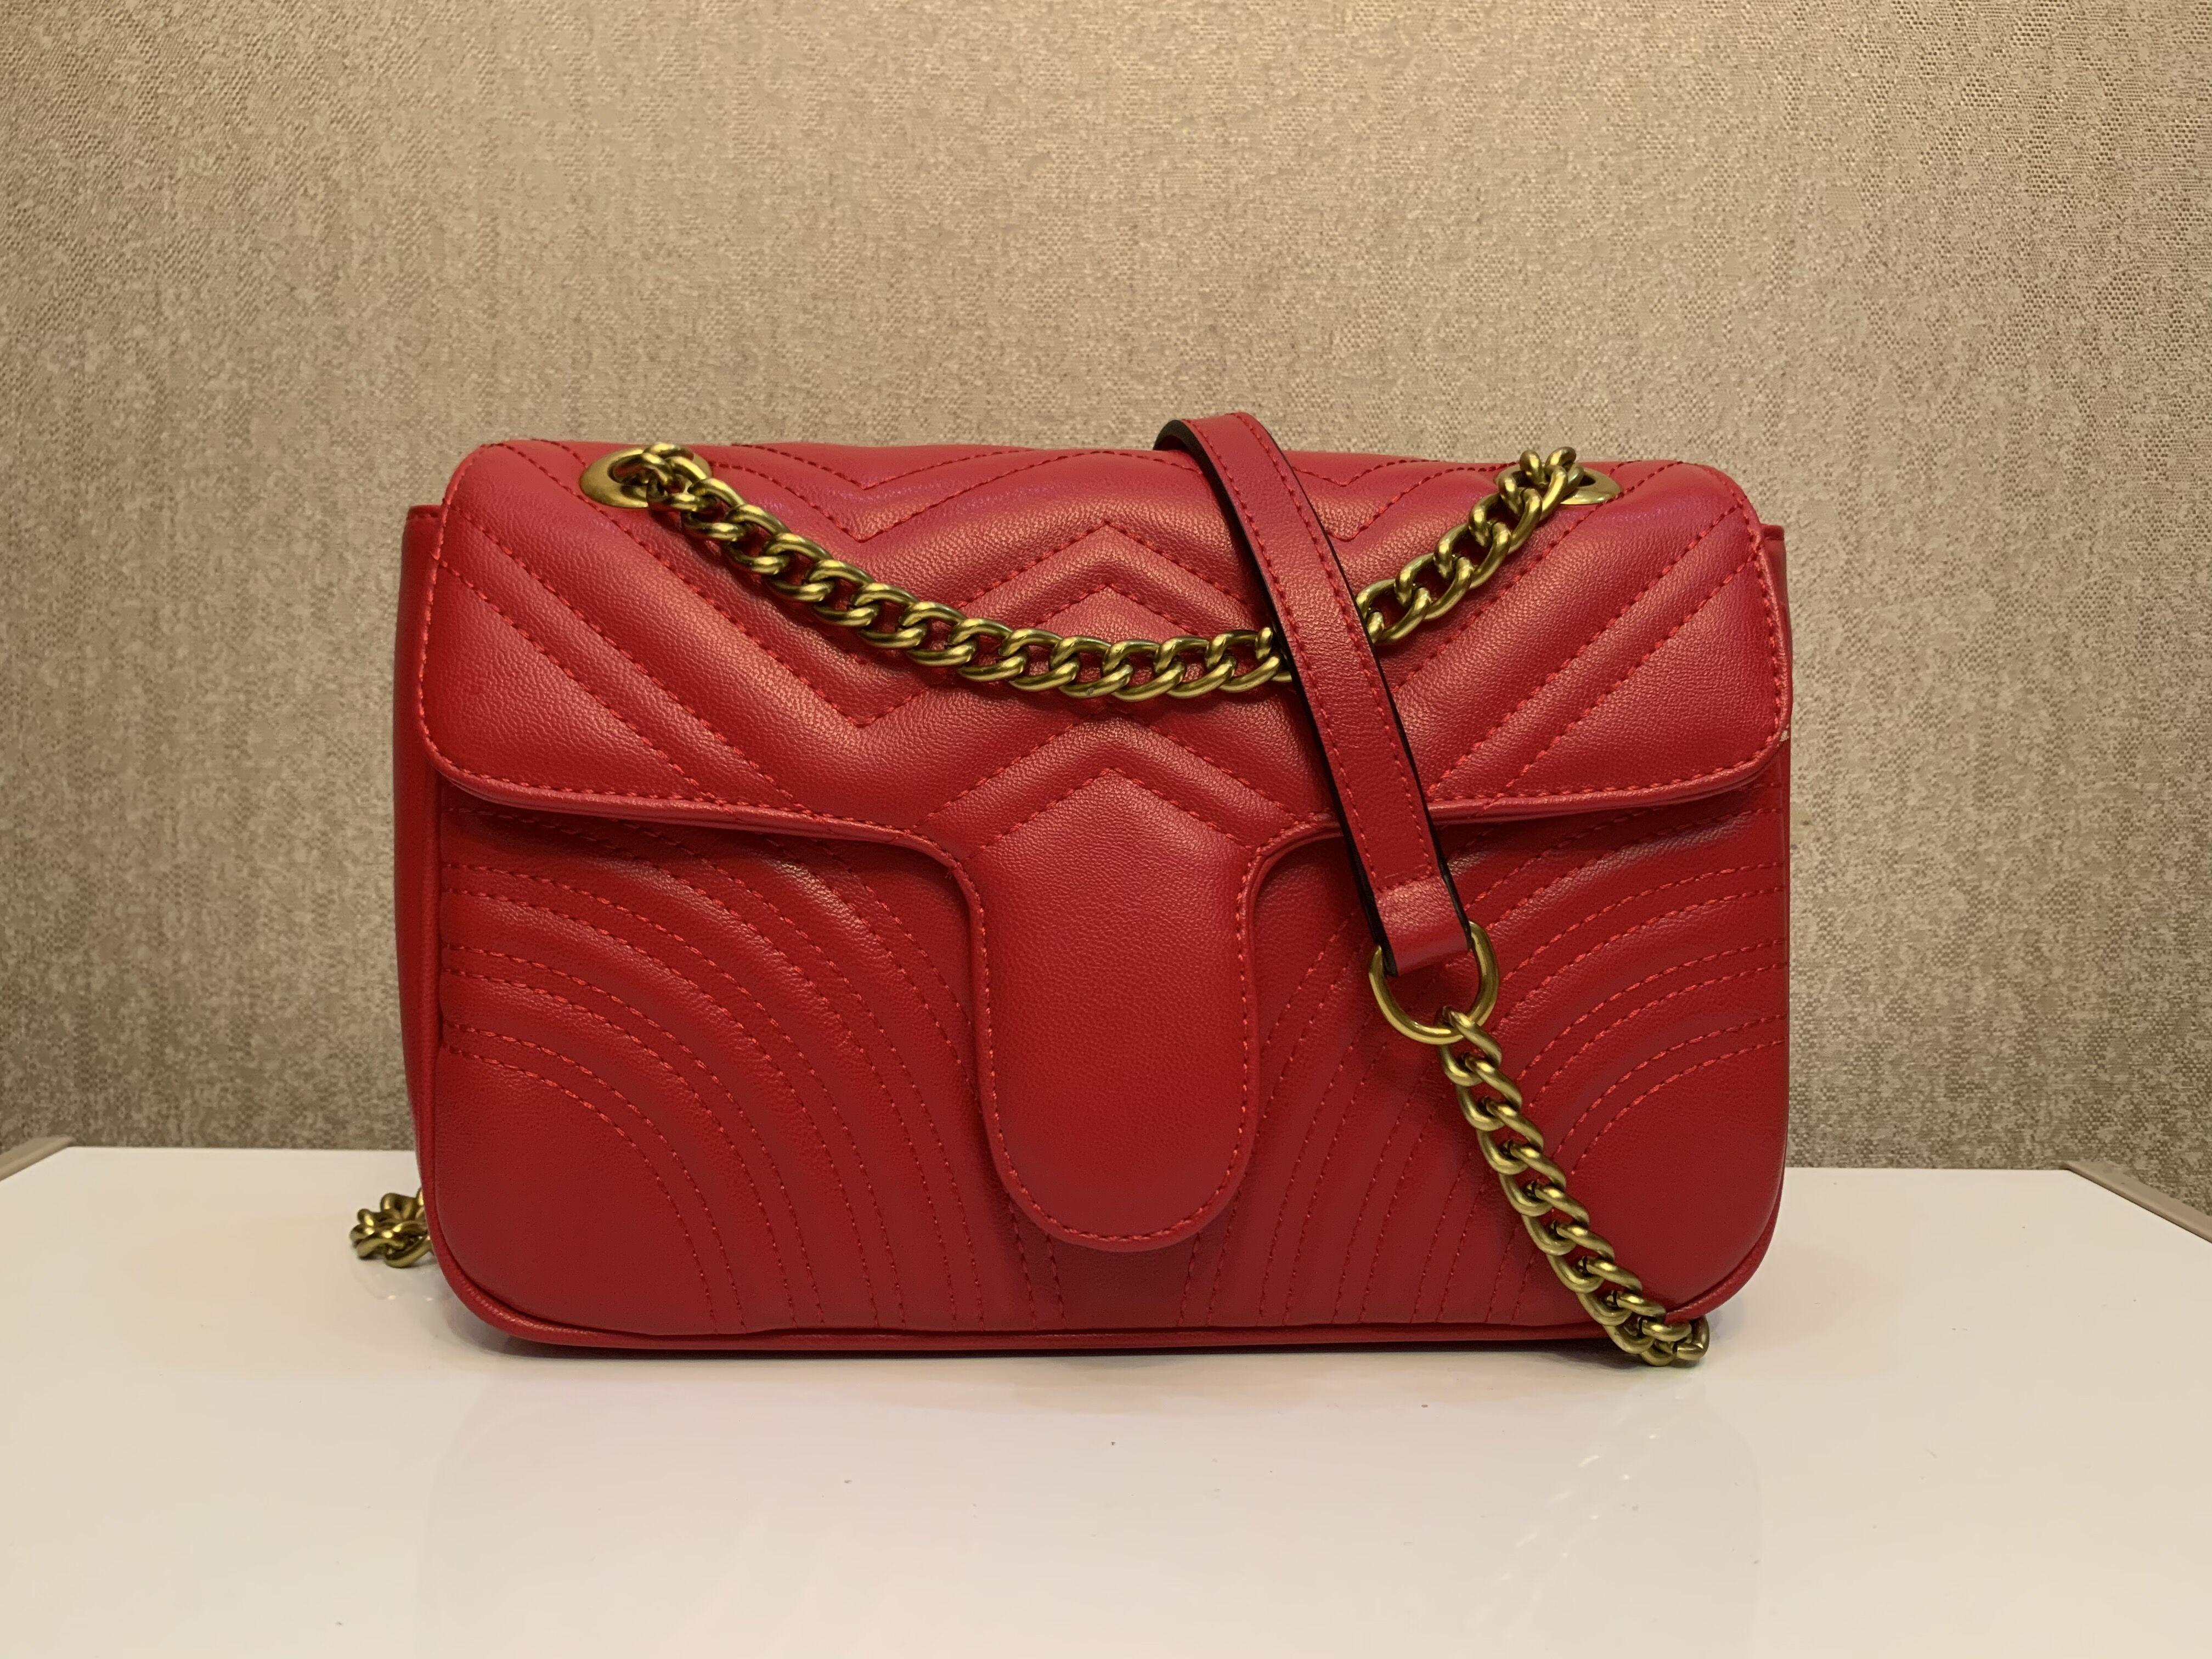 Nova venda saco de couro sacos de ombro clássico messenger mulheres estilo bolsas de ouro cadeia moda mulheres bolsas bolsas de compras coração quente xrpkg